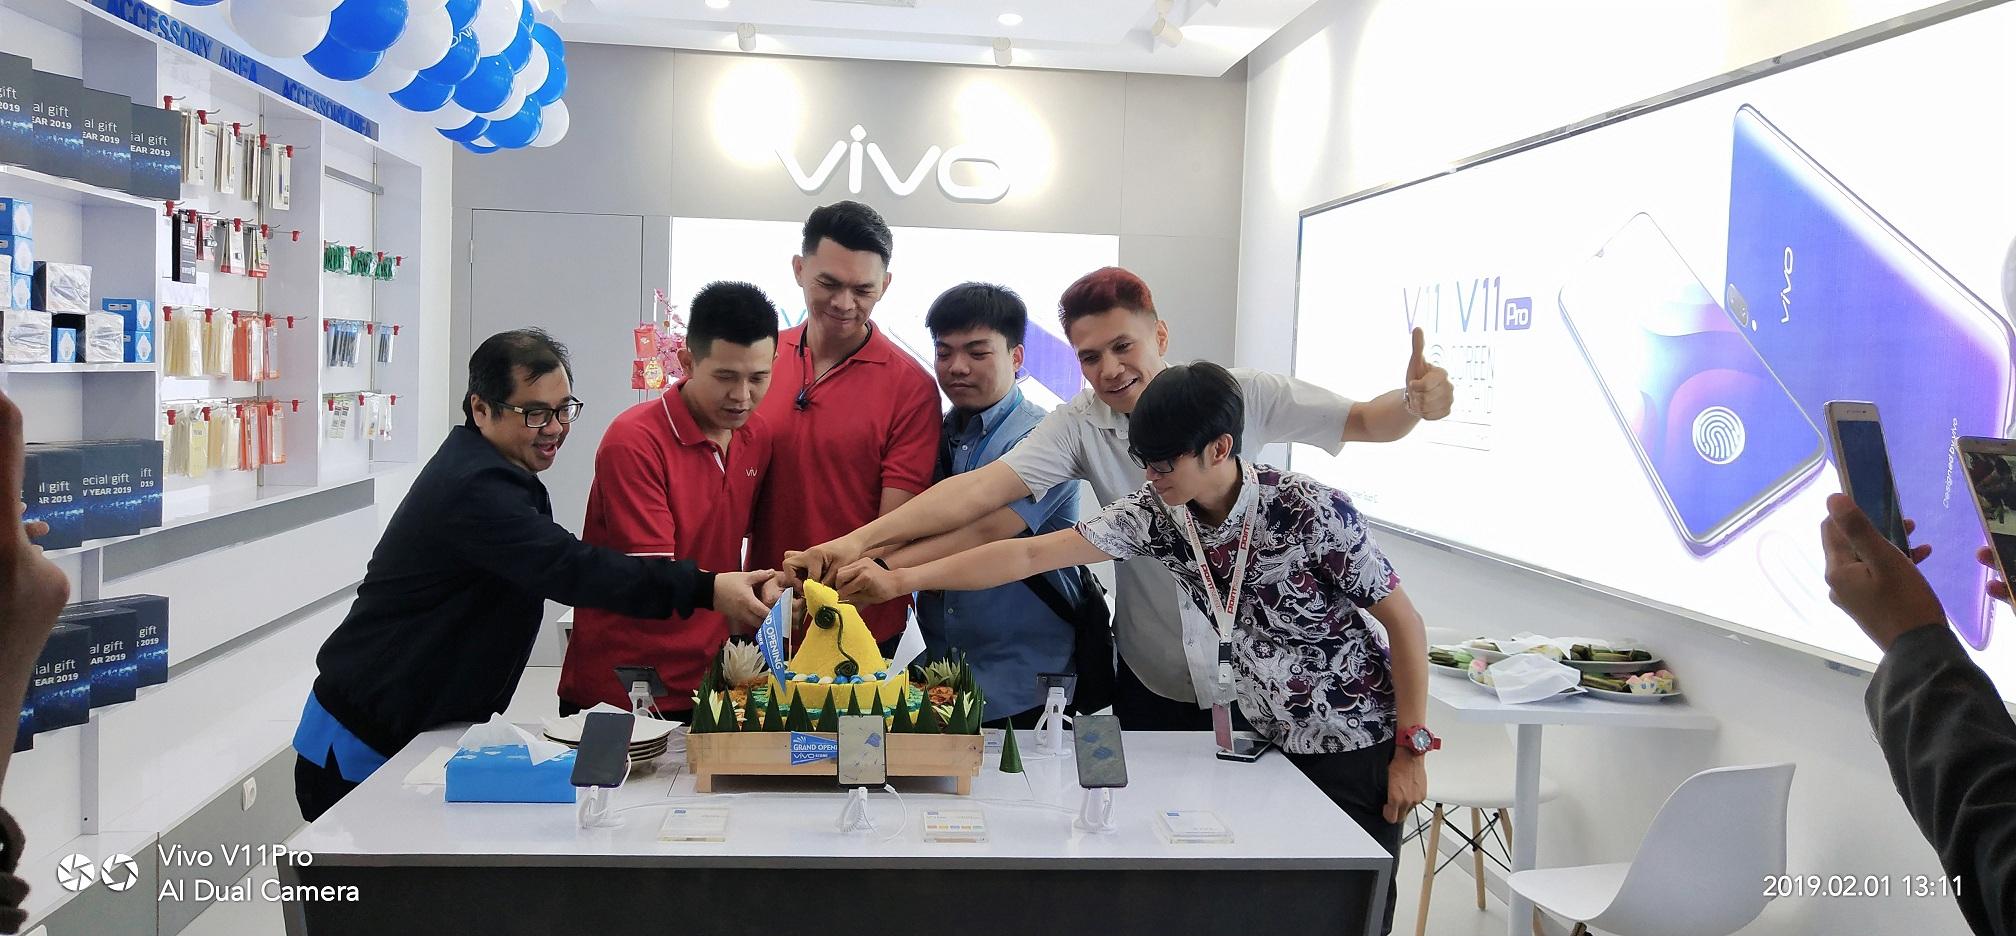 Kini Vivo Store Sudah Hadir di Karawang, Banyak Promo Menarik Ditawarkan